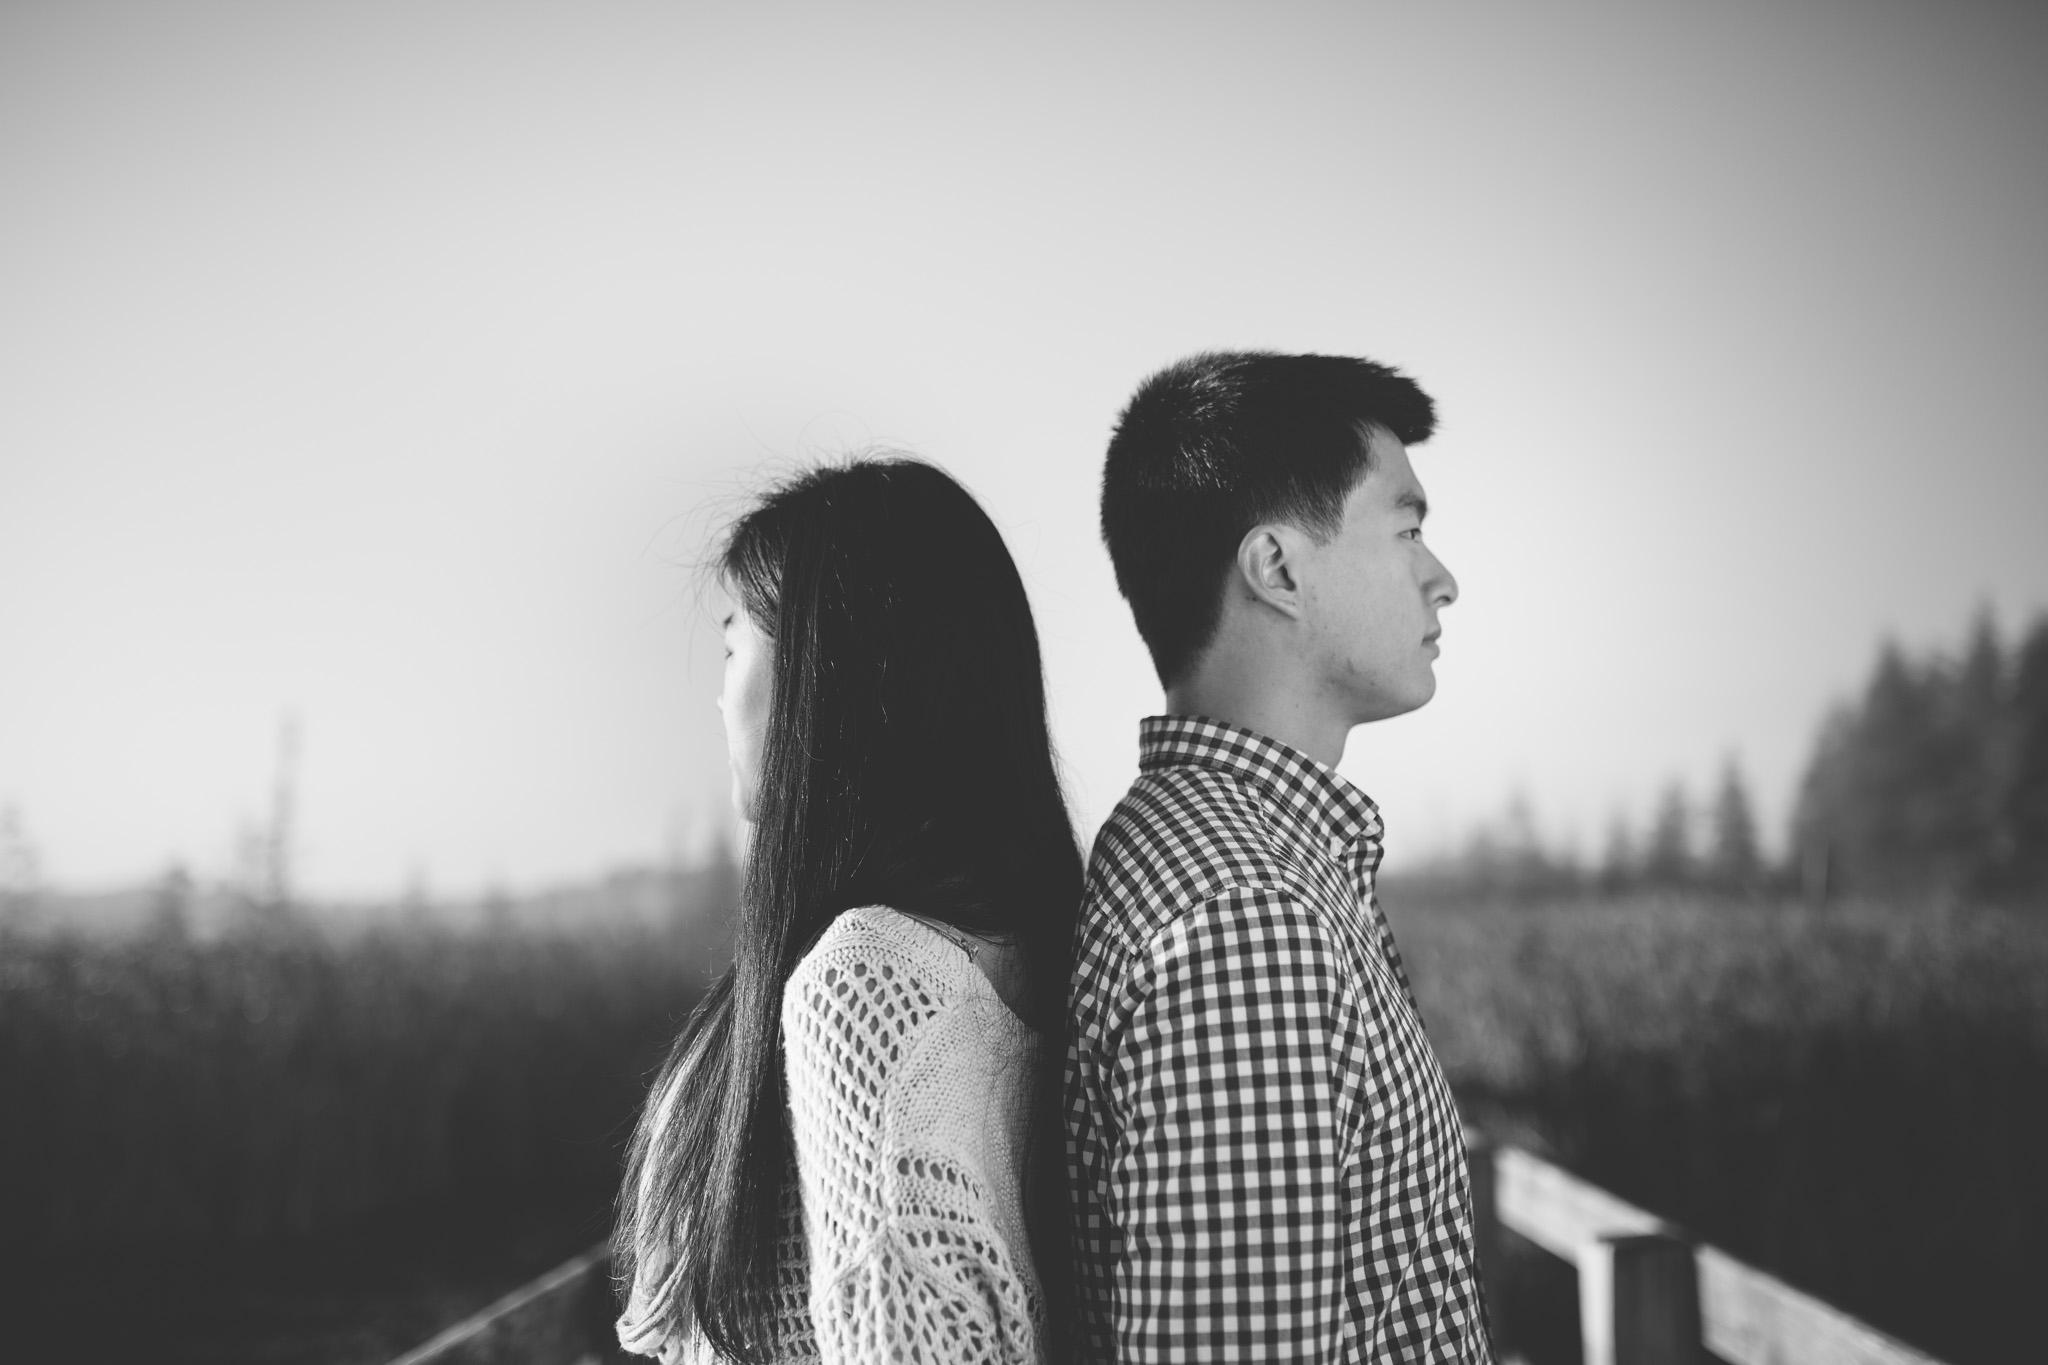 041-Jonathan-Kuhn-Photography-Henry-Jessica-Engagement-WEB-0628.jpg